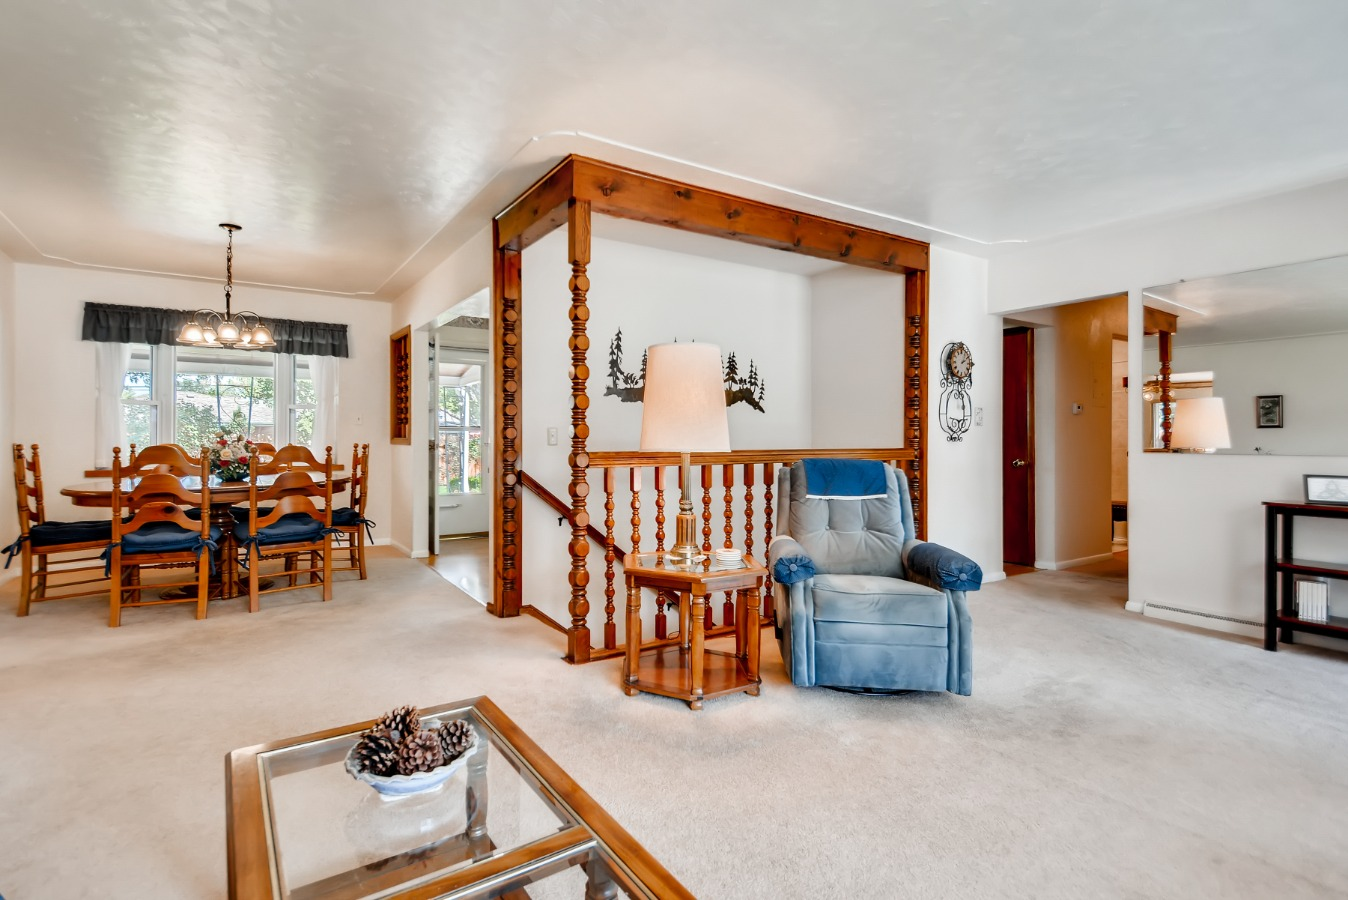 Dining Room – Living Room Arrangements